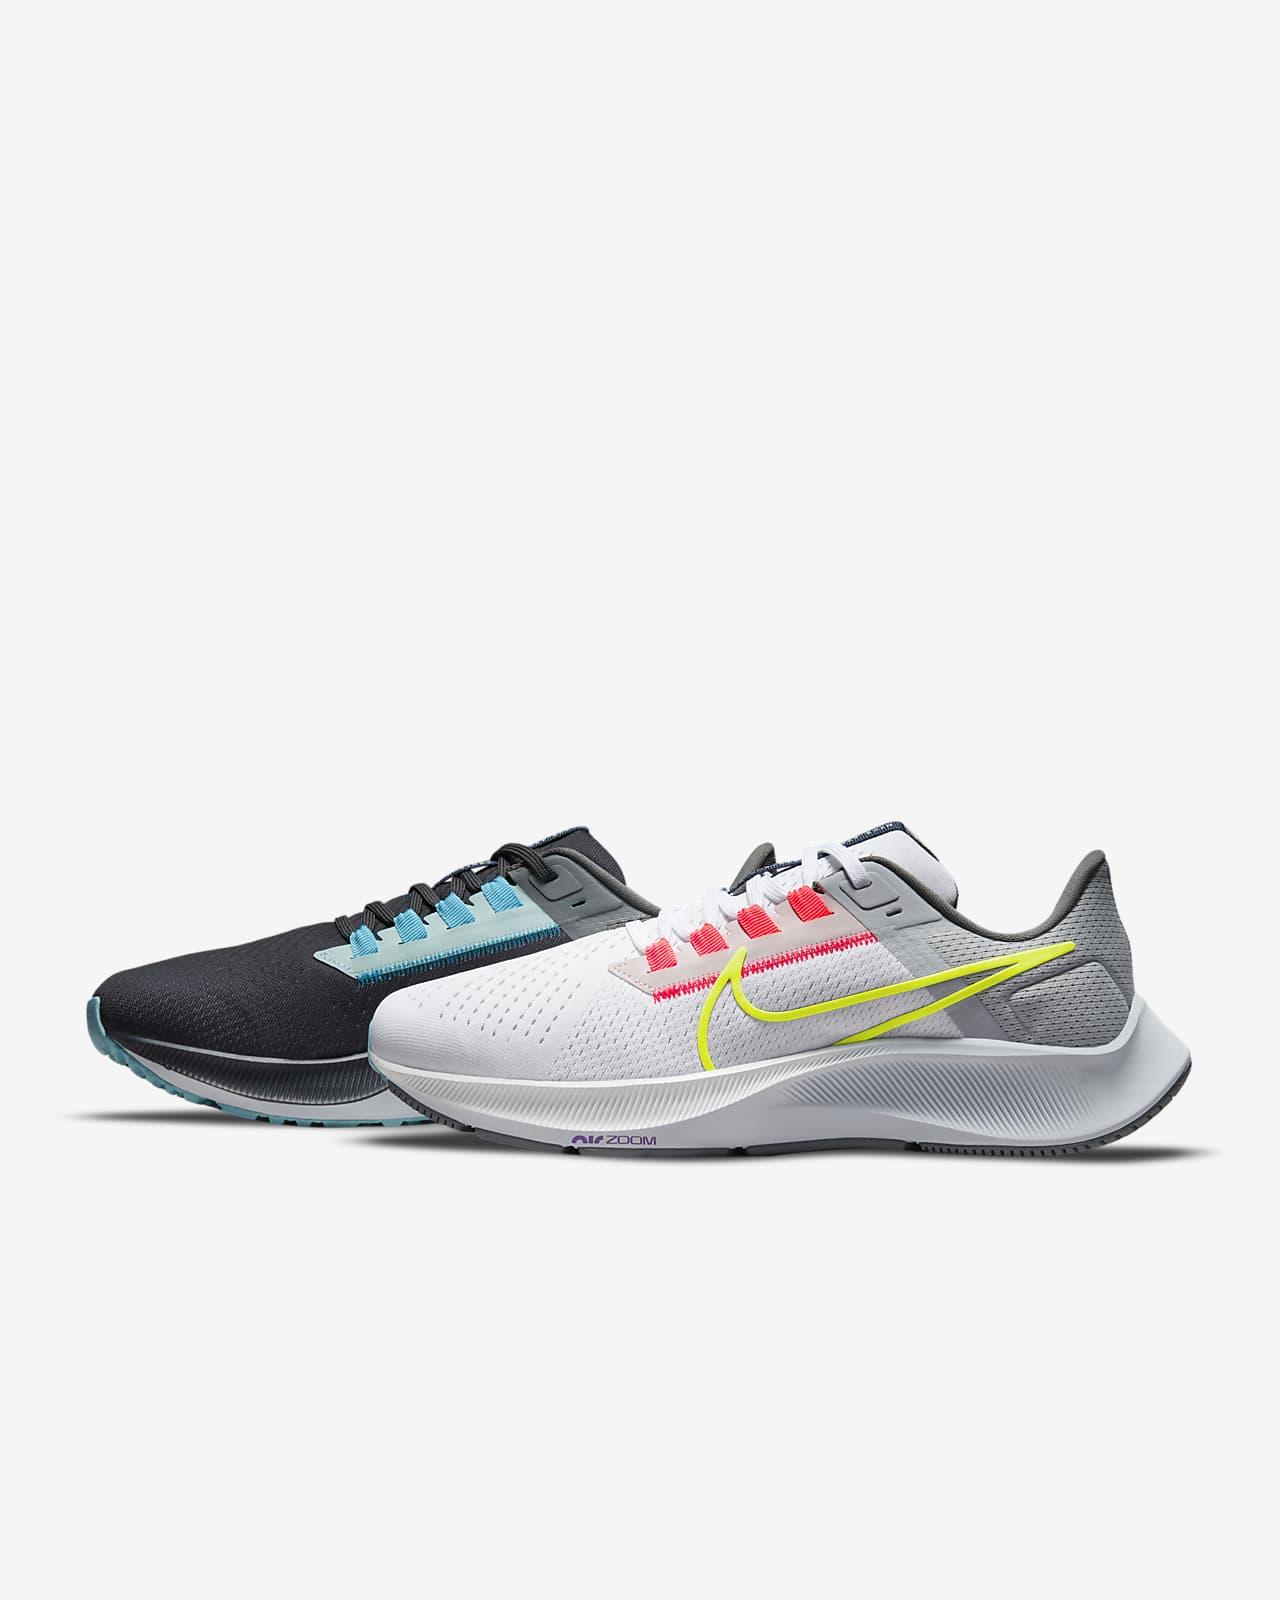 Nike Air Zoom Pegasus 38 Limited Edition Women's Running Shoe